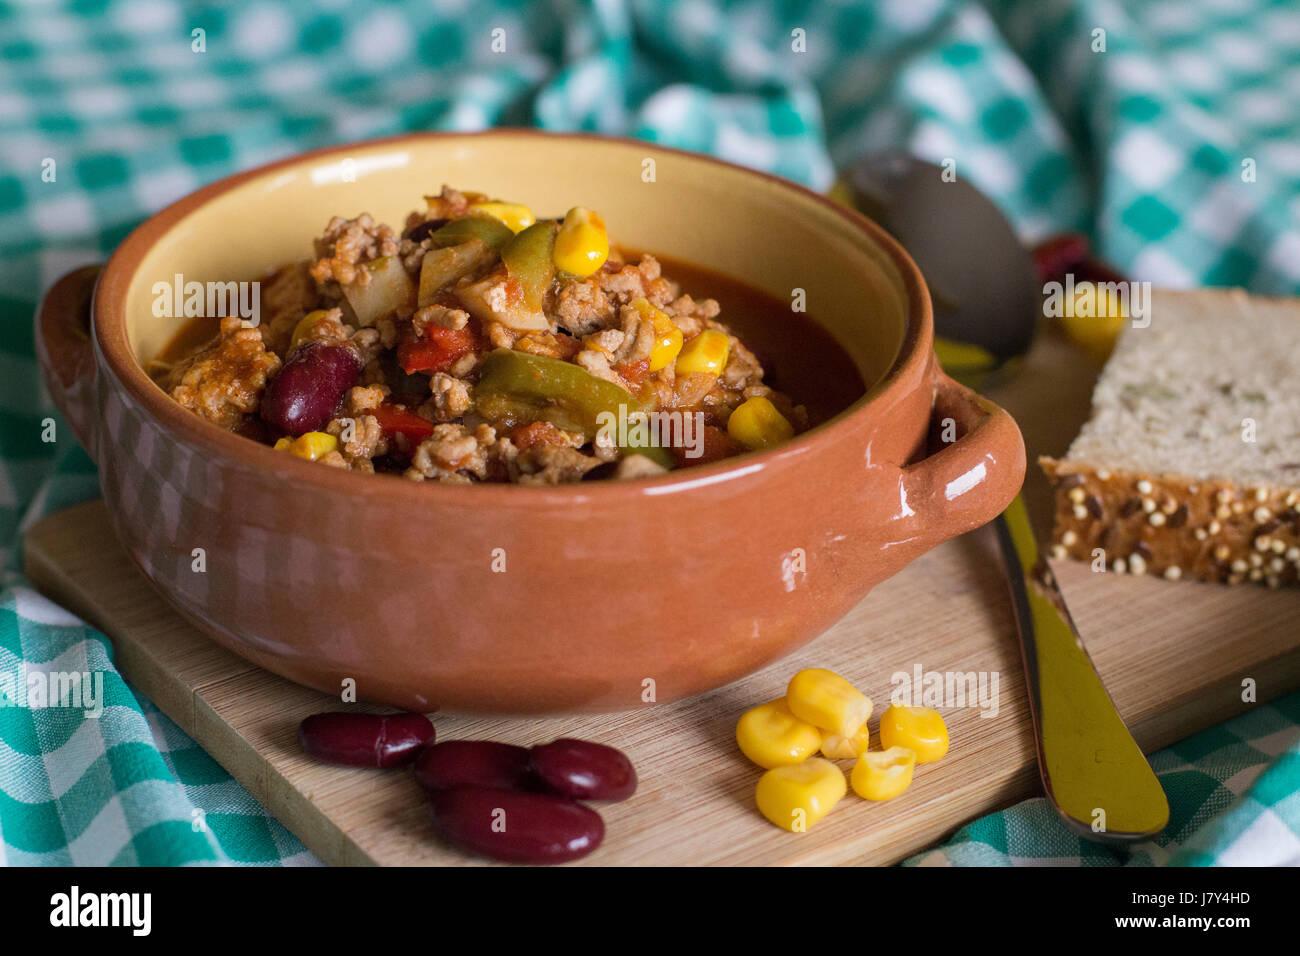 plate of chilli con carne - Stock Image